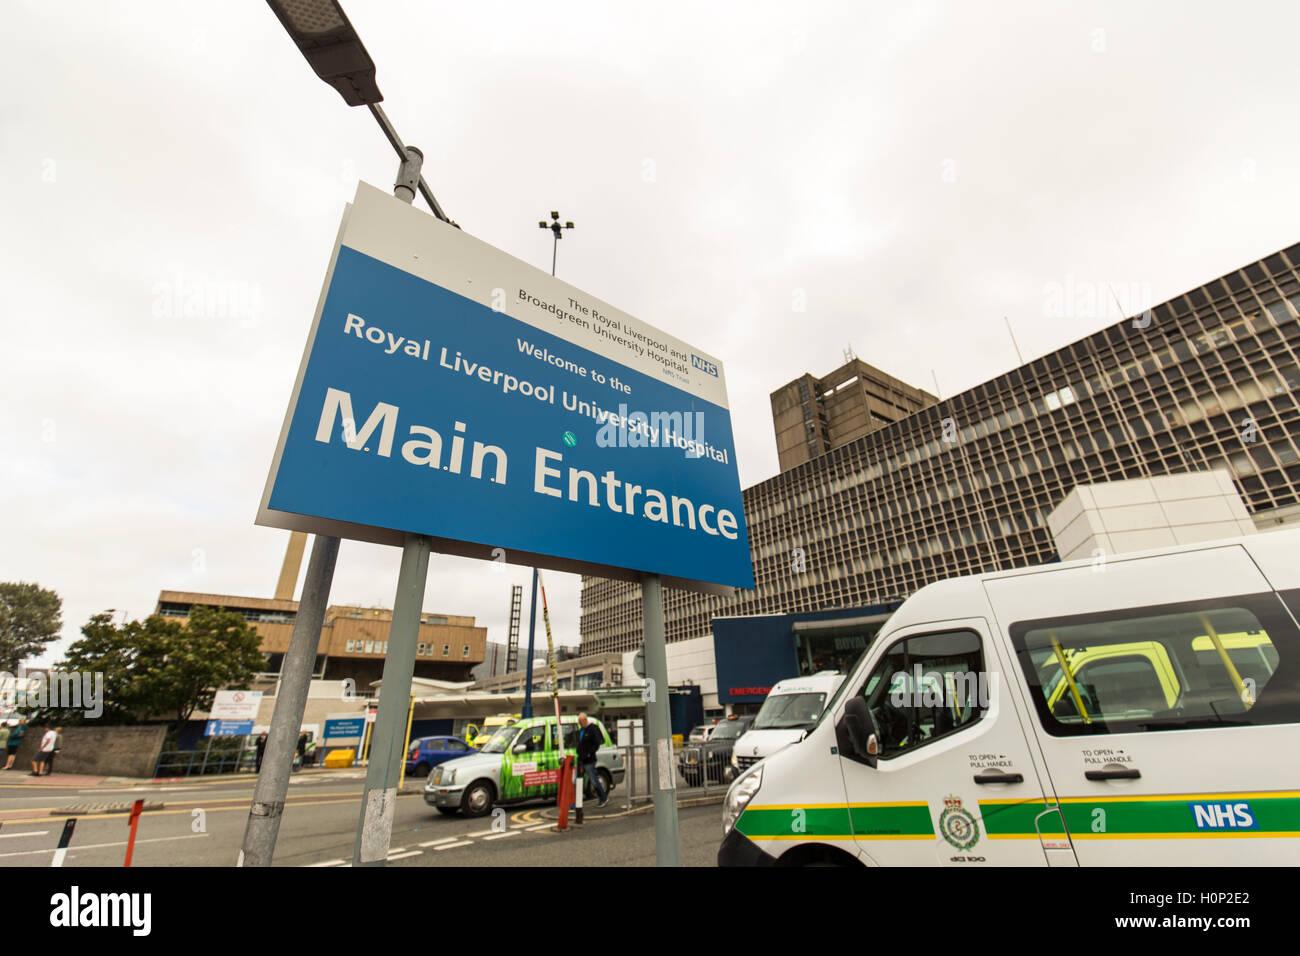 Royal Liverpool University Hospital , England - Stock Image